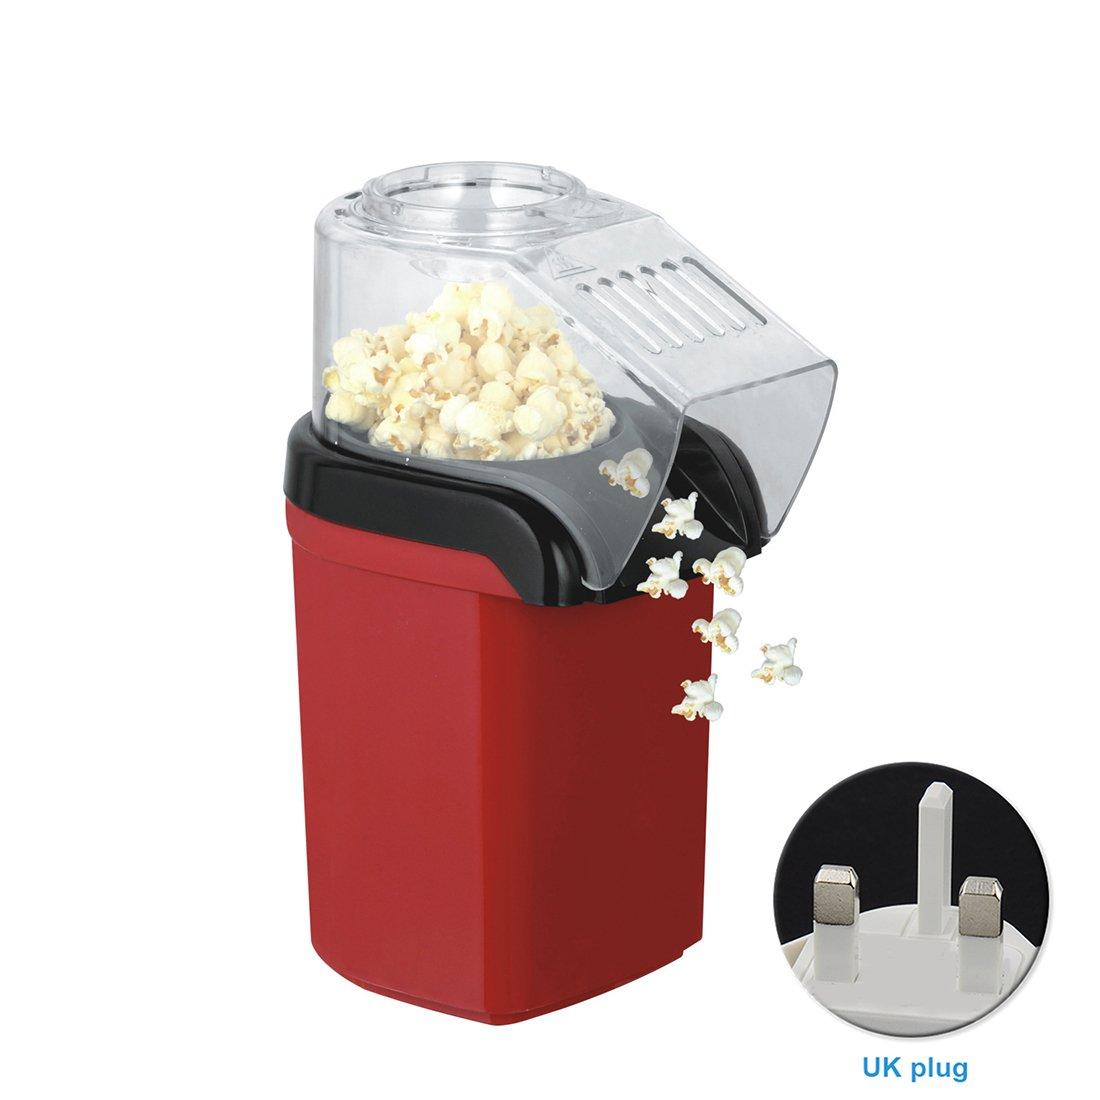 Hot Air Popcorn Maker, Fresh Popcorn Maker Perfect for Movie Night 110/220V